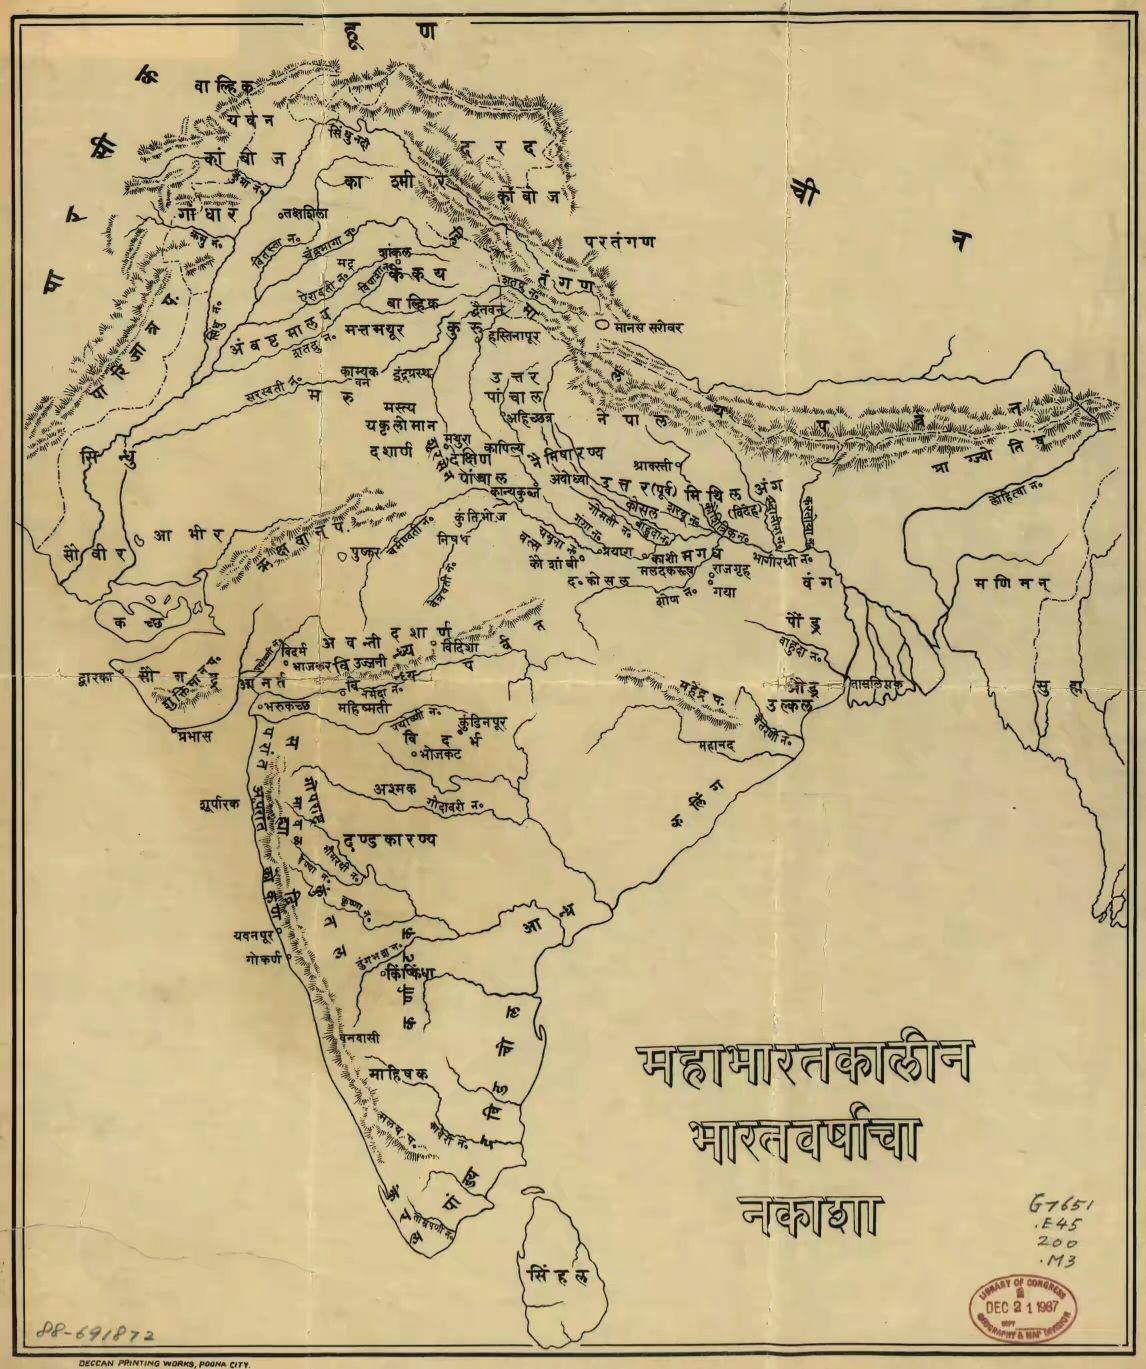 Old India Map Mahabharata period map of Ancient India   in Devnagri script | Old